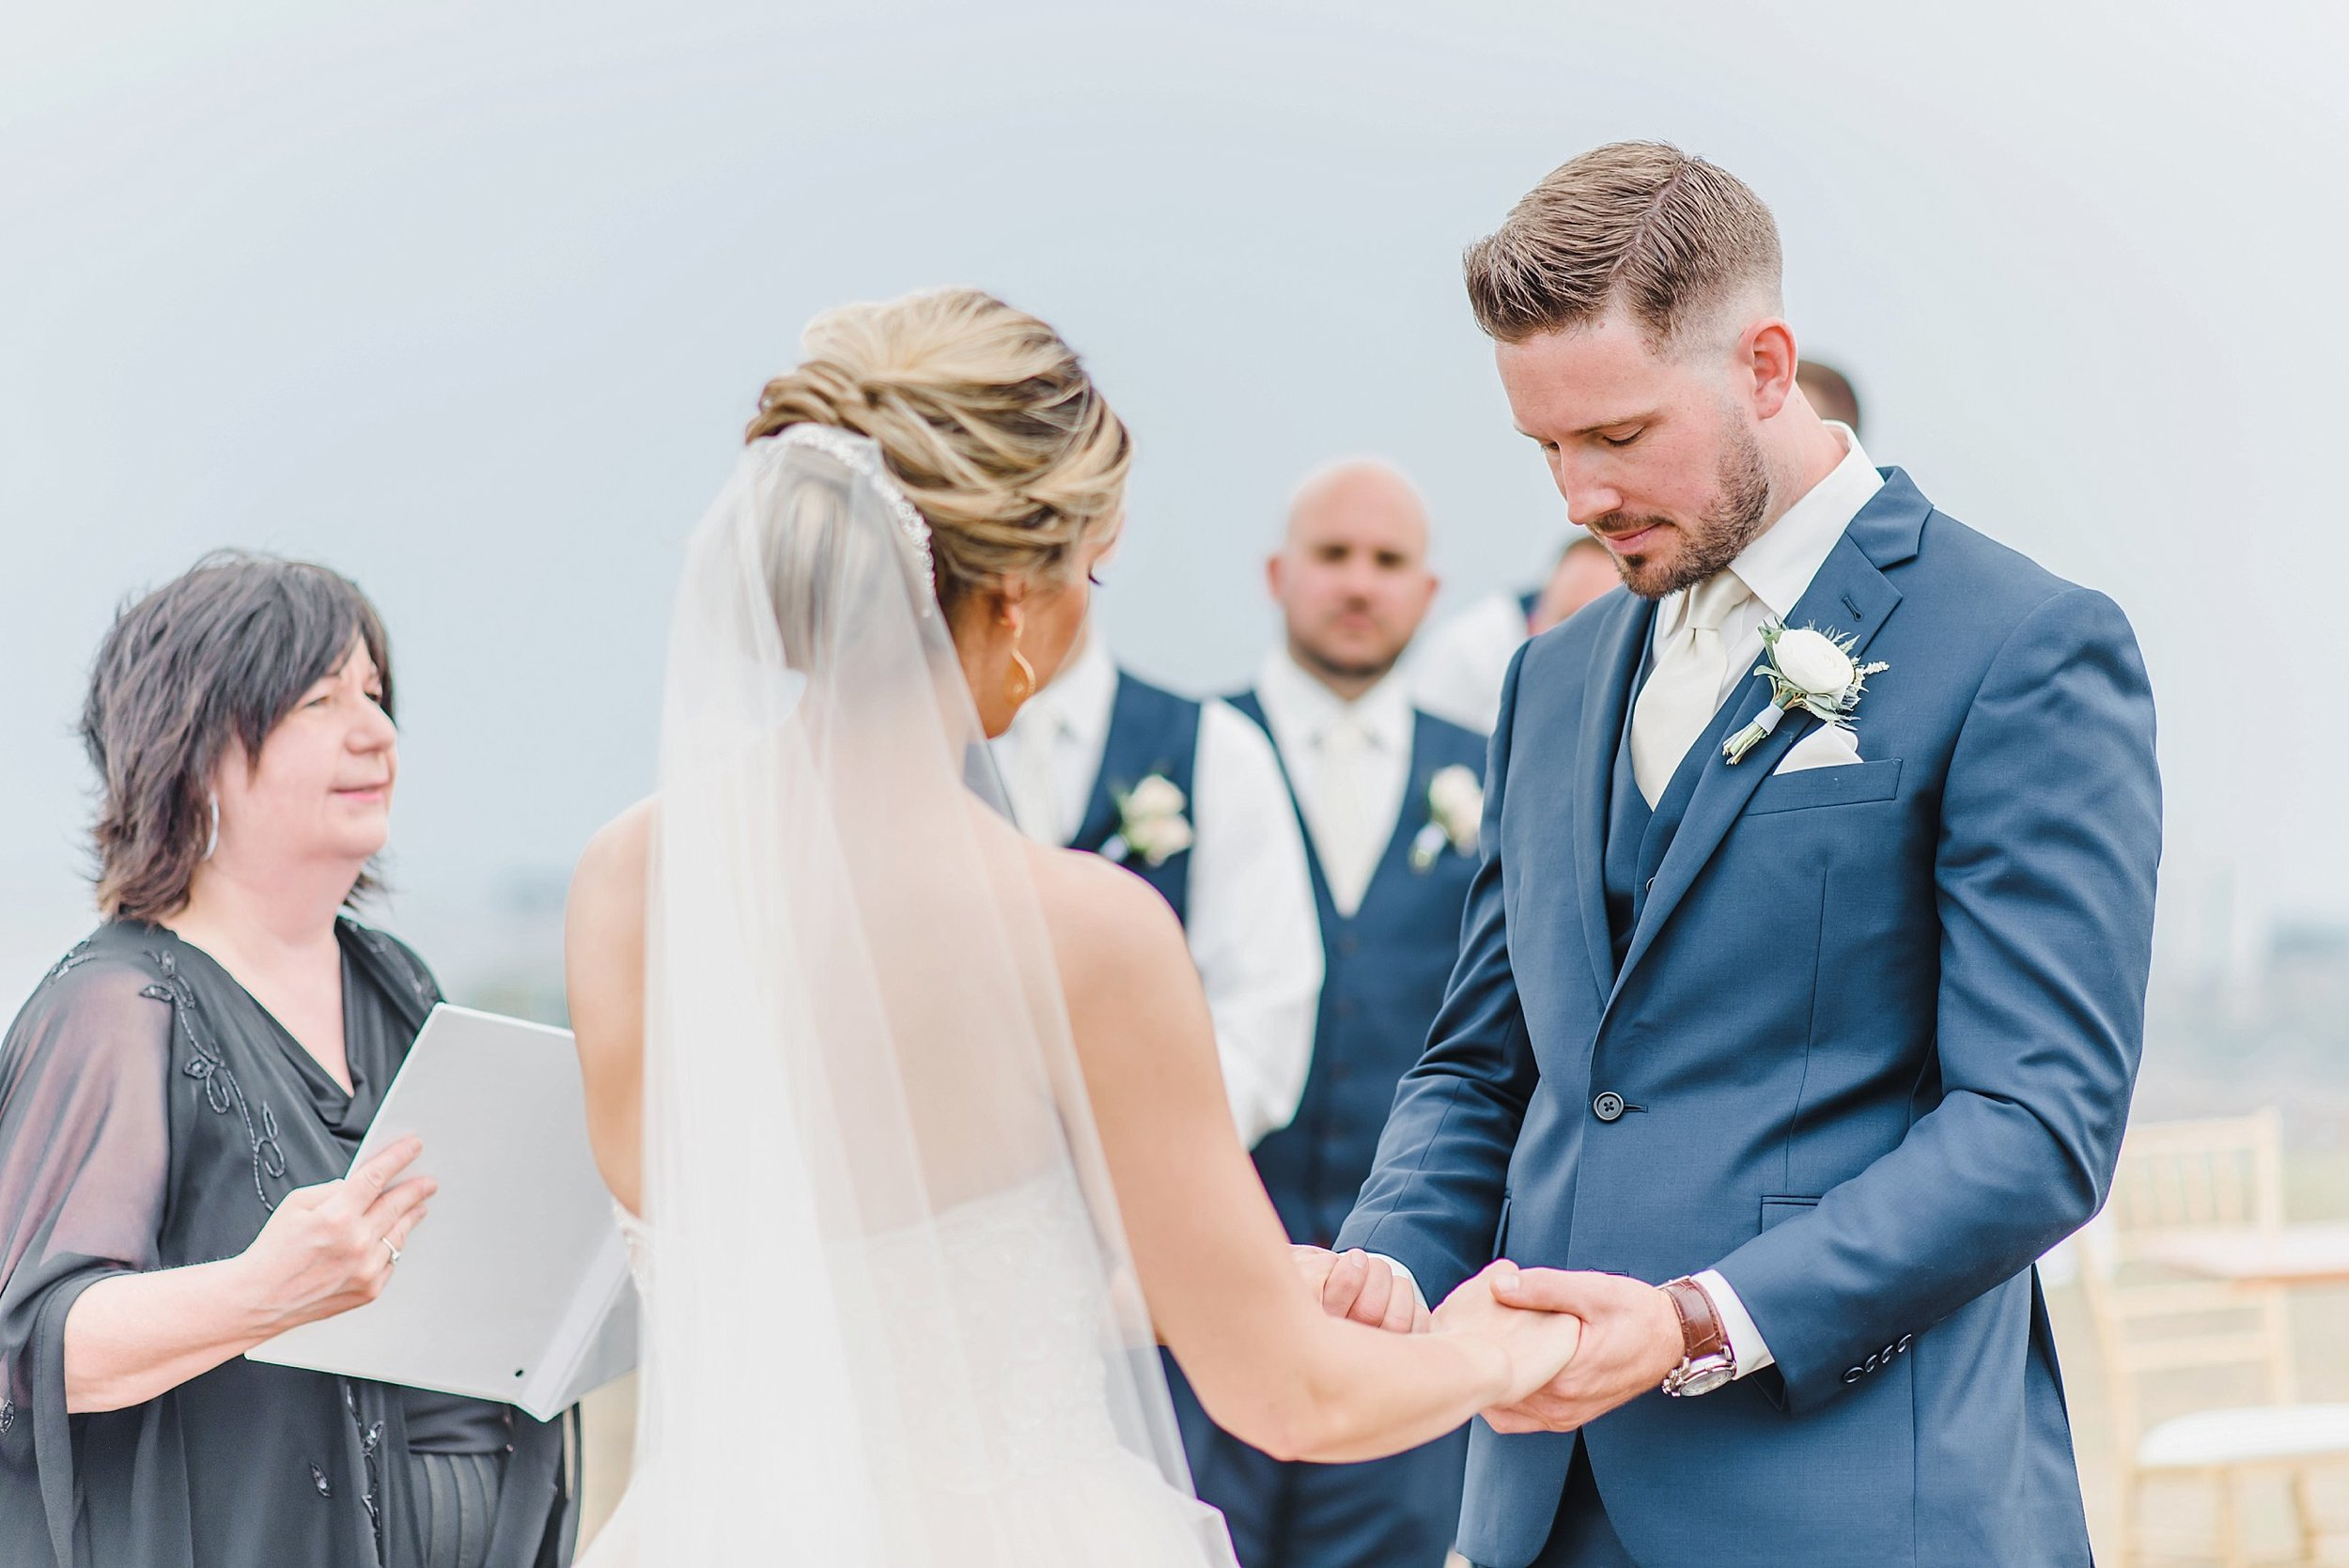 light airy indie fine art ottawa wedding photographer | Ali and Batoul Photography_0184.jpg